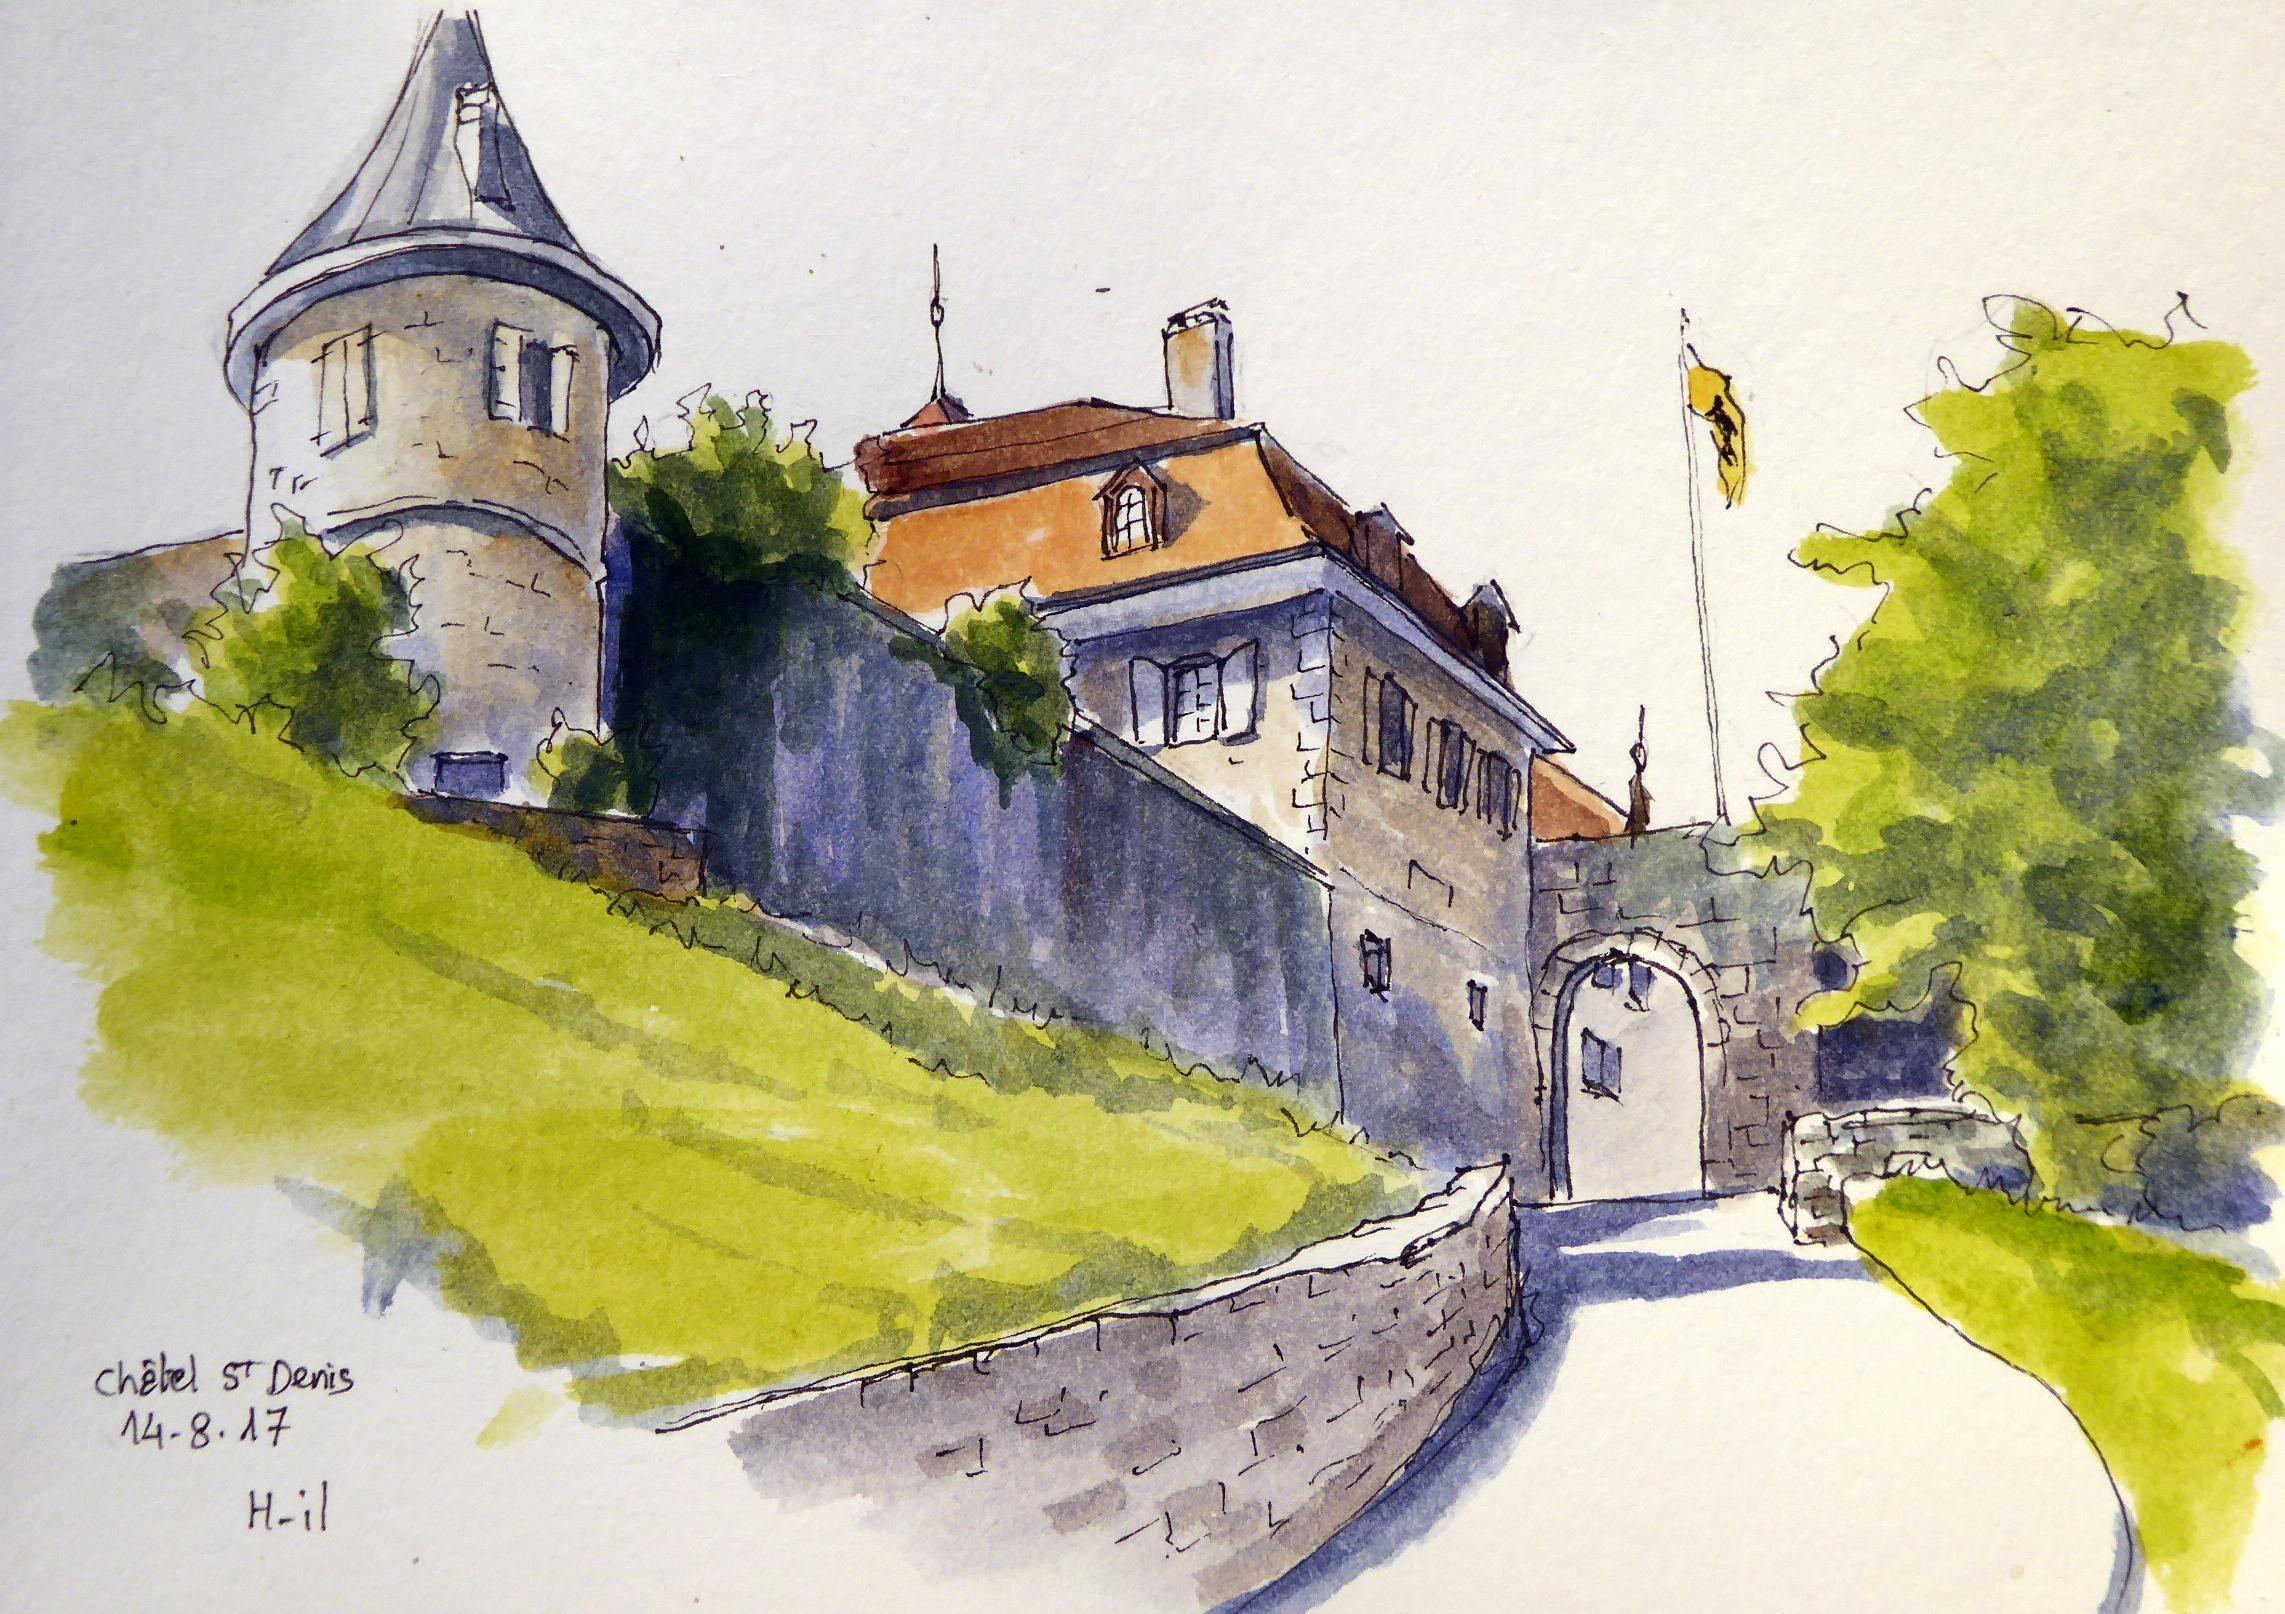 Châtel-St_Denis (1)